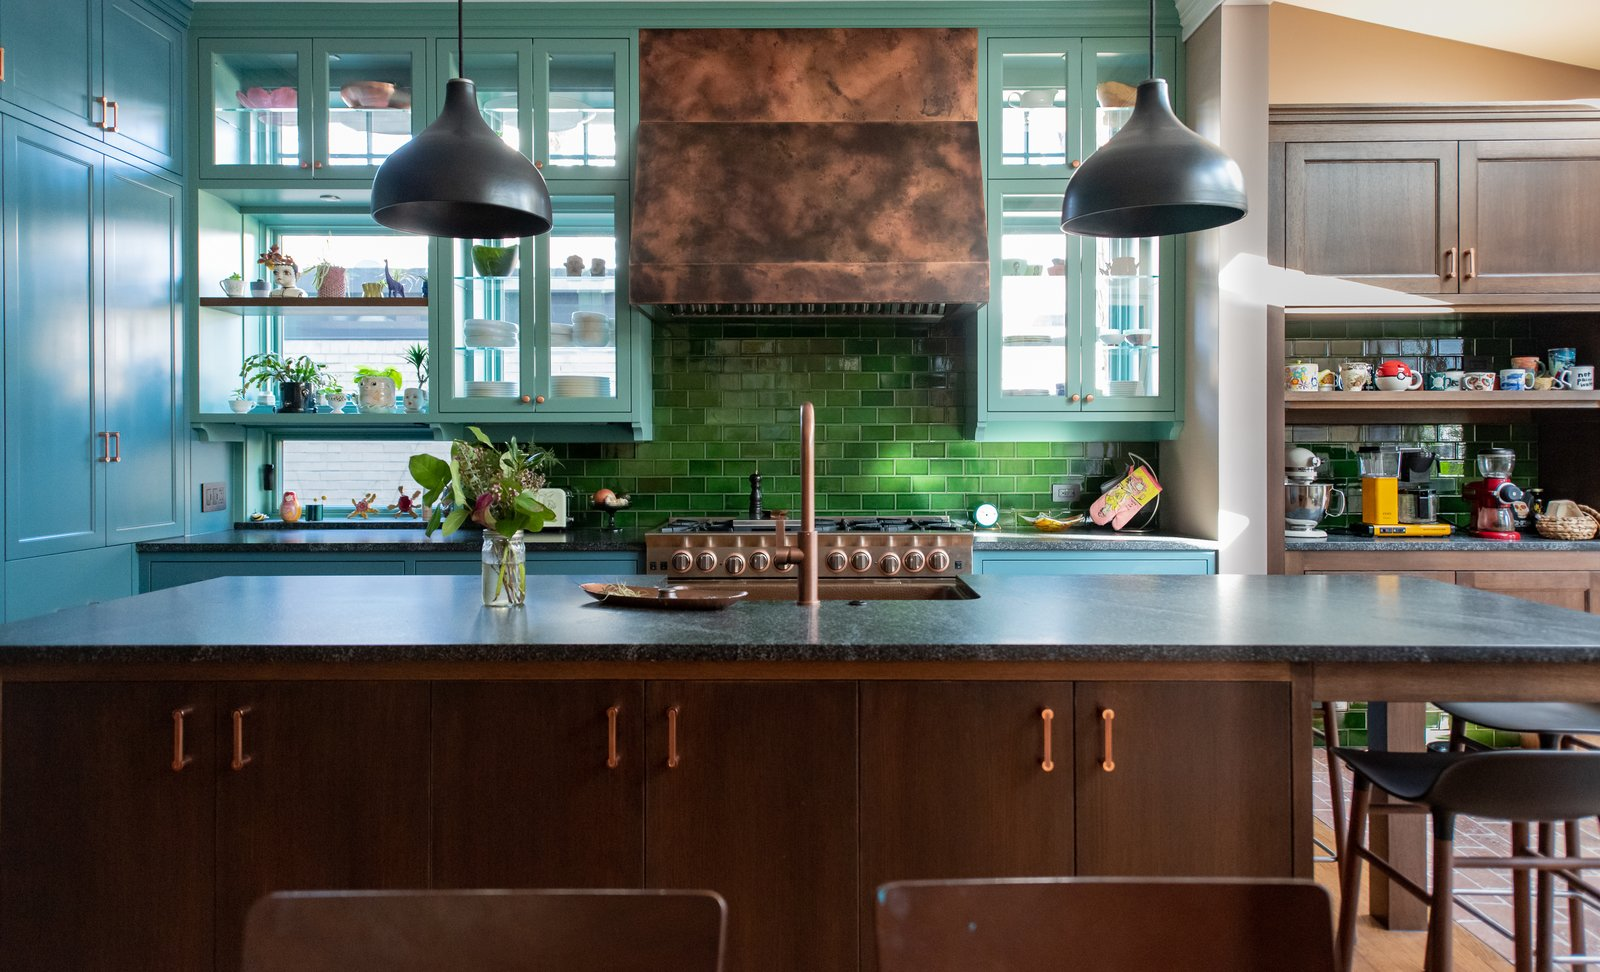 Dead Salmon Kitchen Remodel by Shumaker Design + Build Associates kitchen